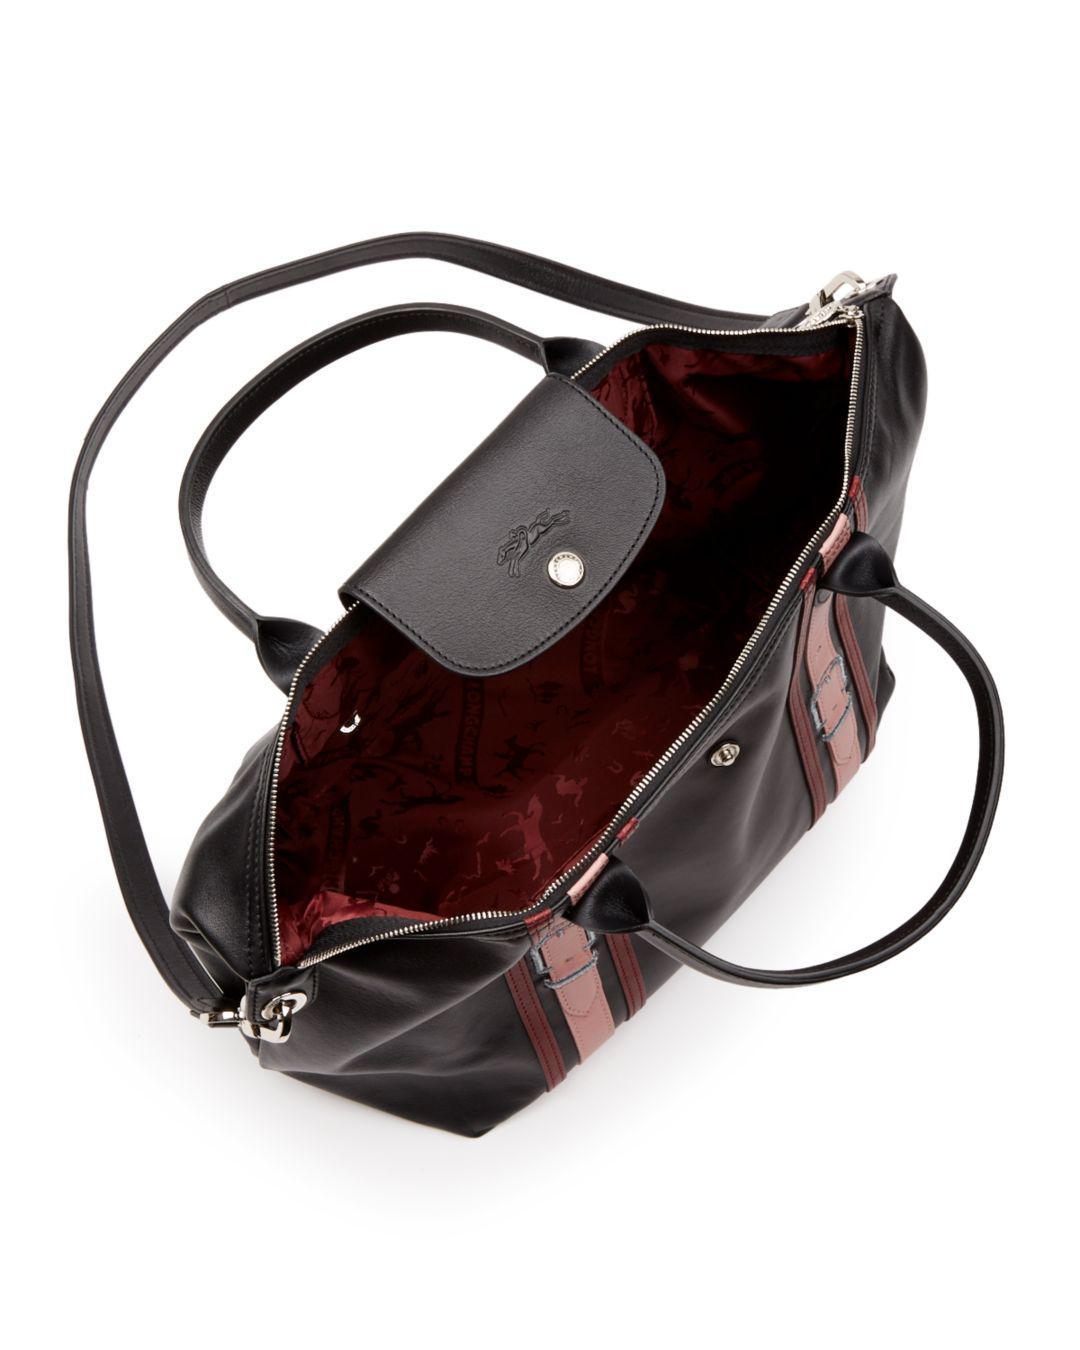 4f51ec3e08 Lyst - Longchamp Le Pliage Cuir Bride Medium Leather Tote in Black